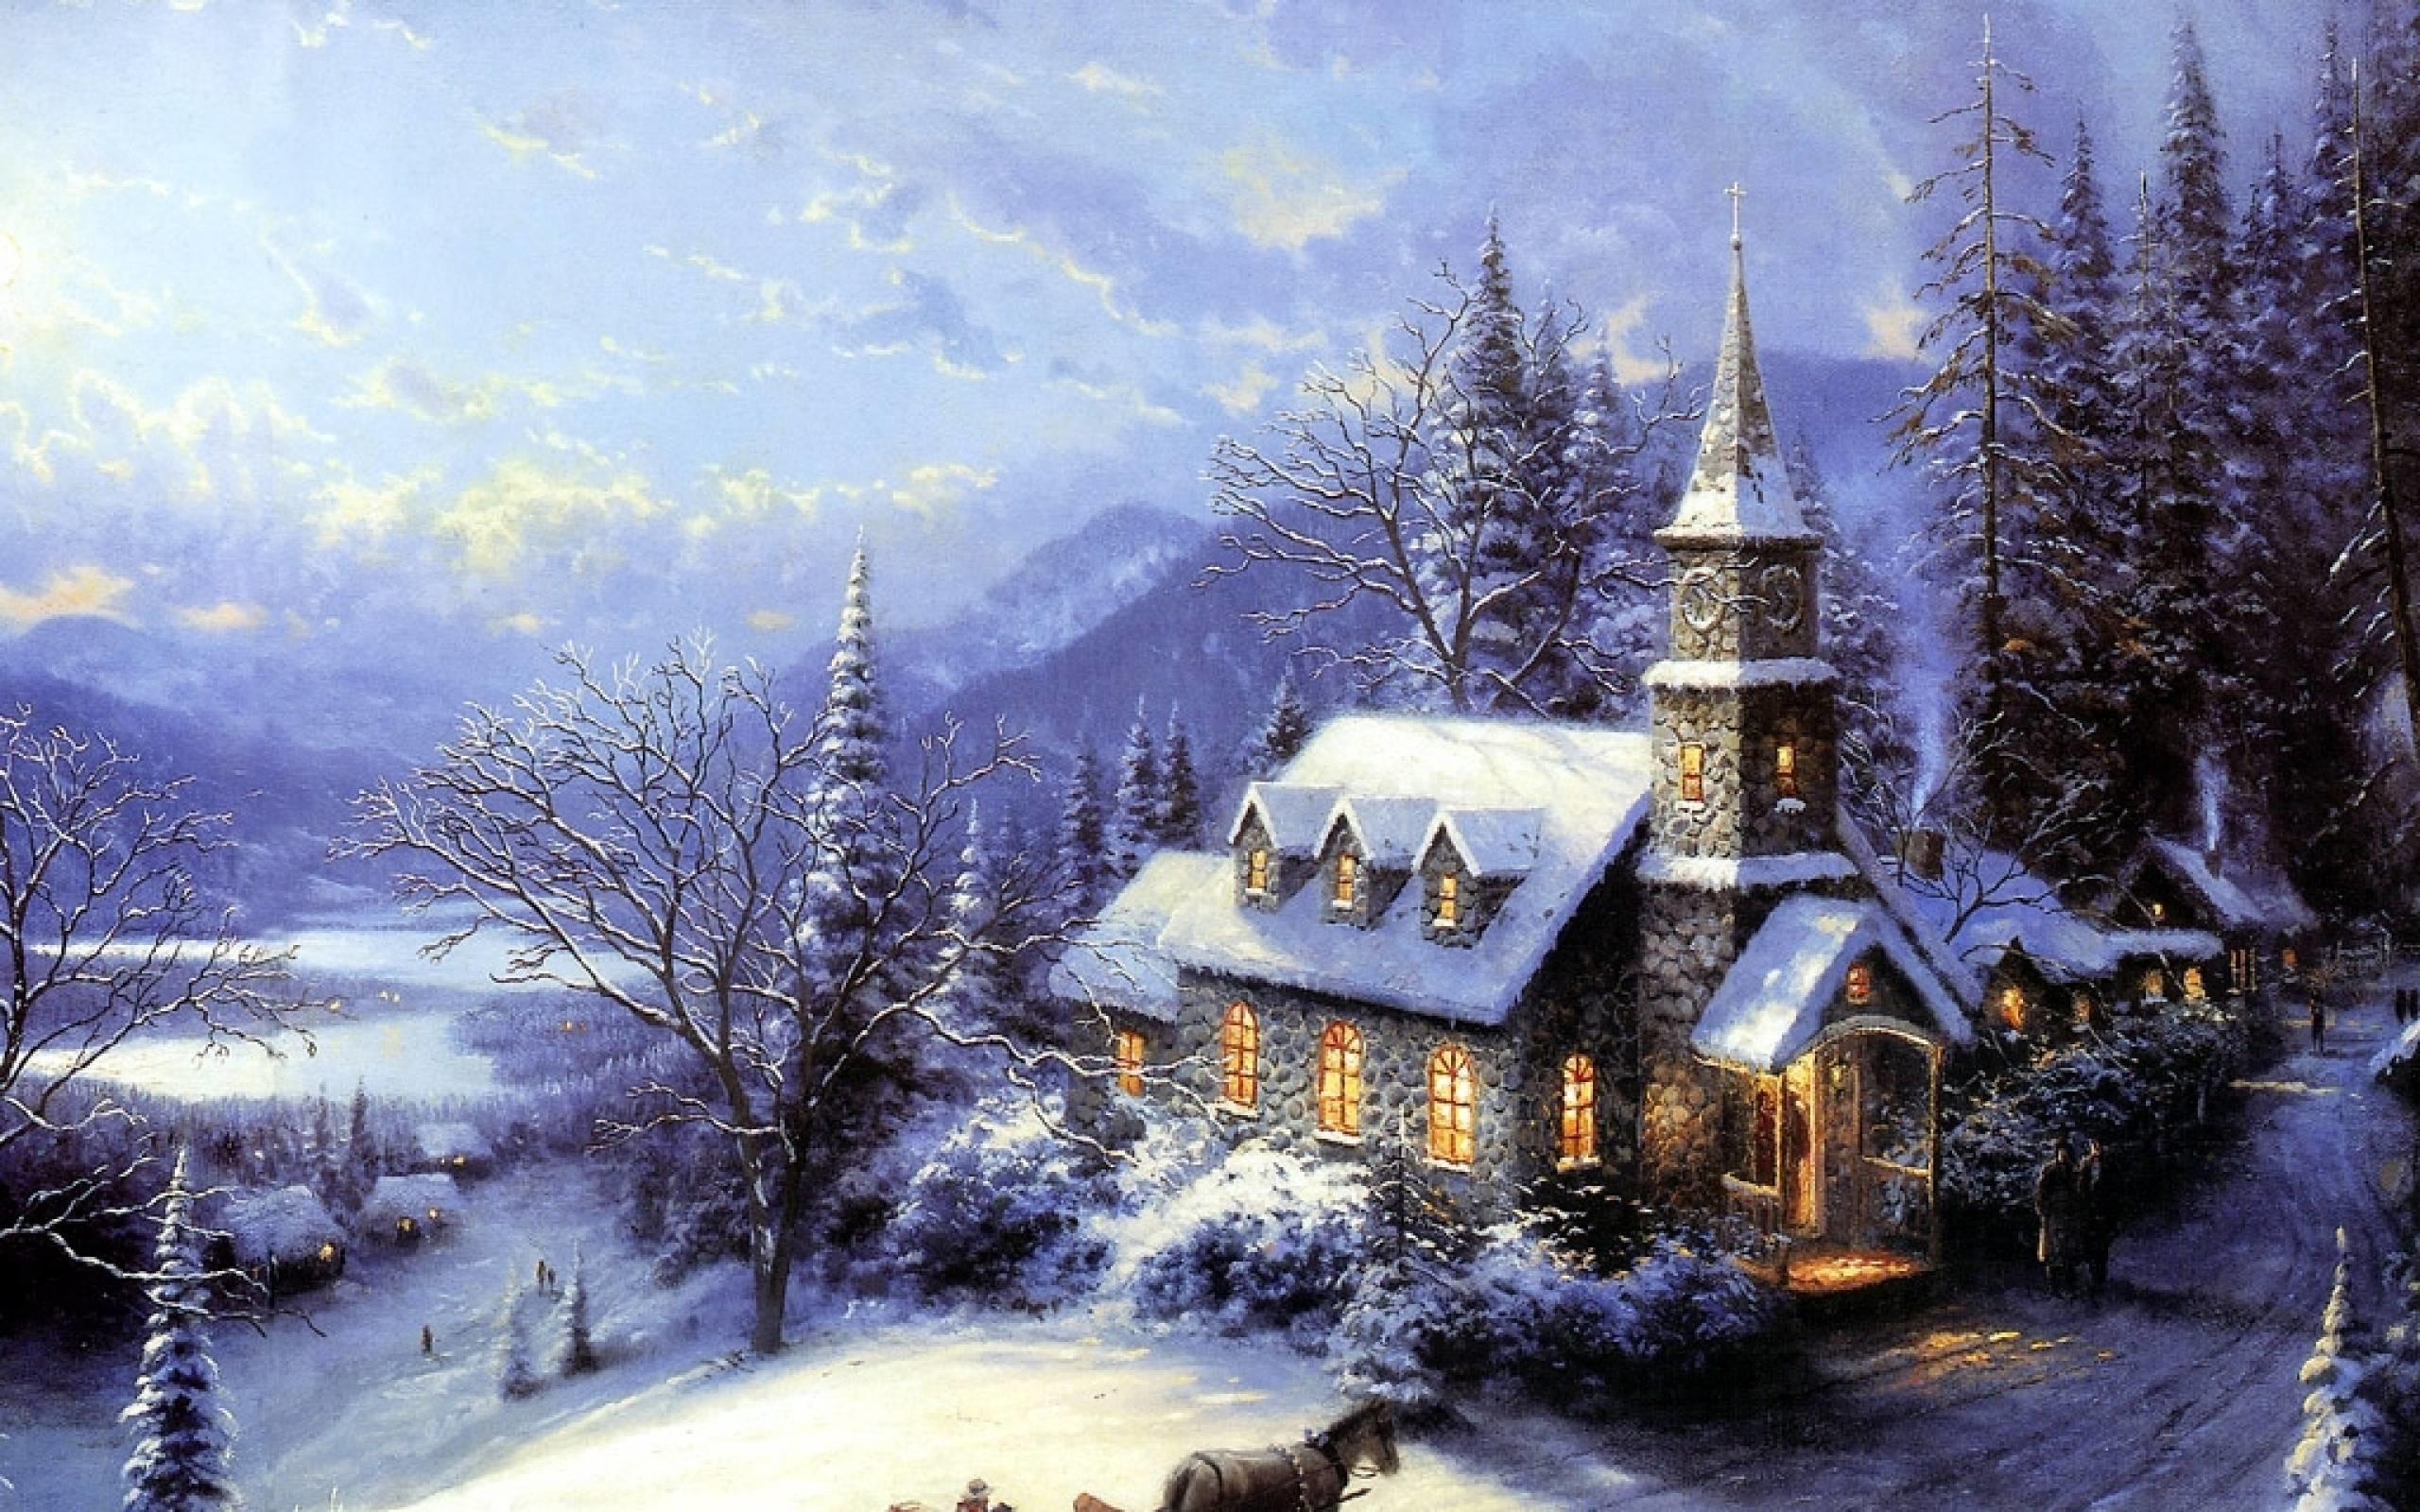 2560x1600 Xmas Stuff For Thomas Kinkade Christmas Tree Wallpaper